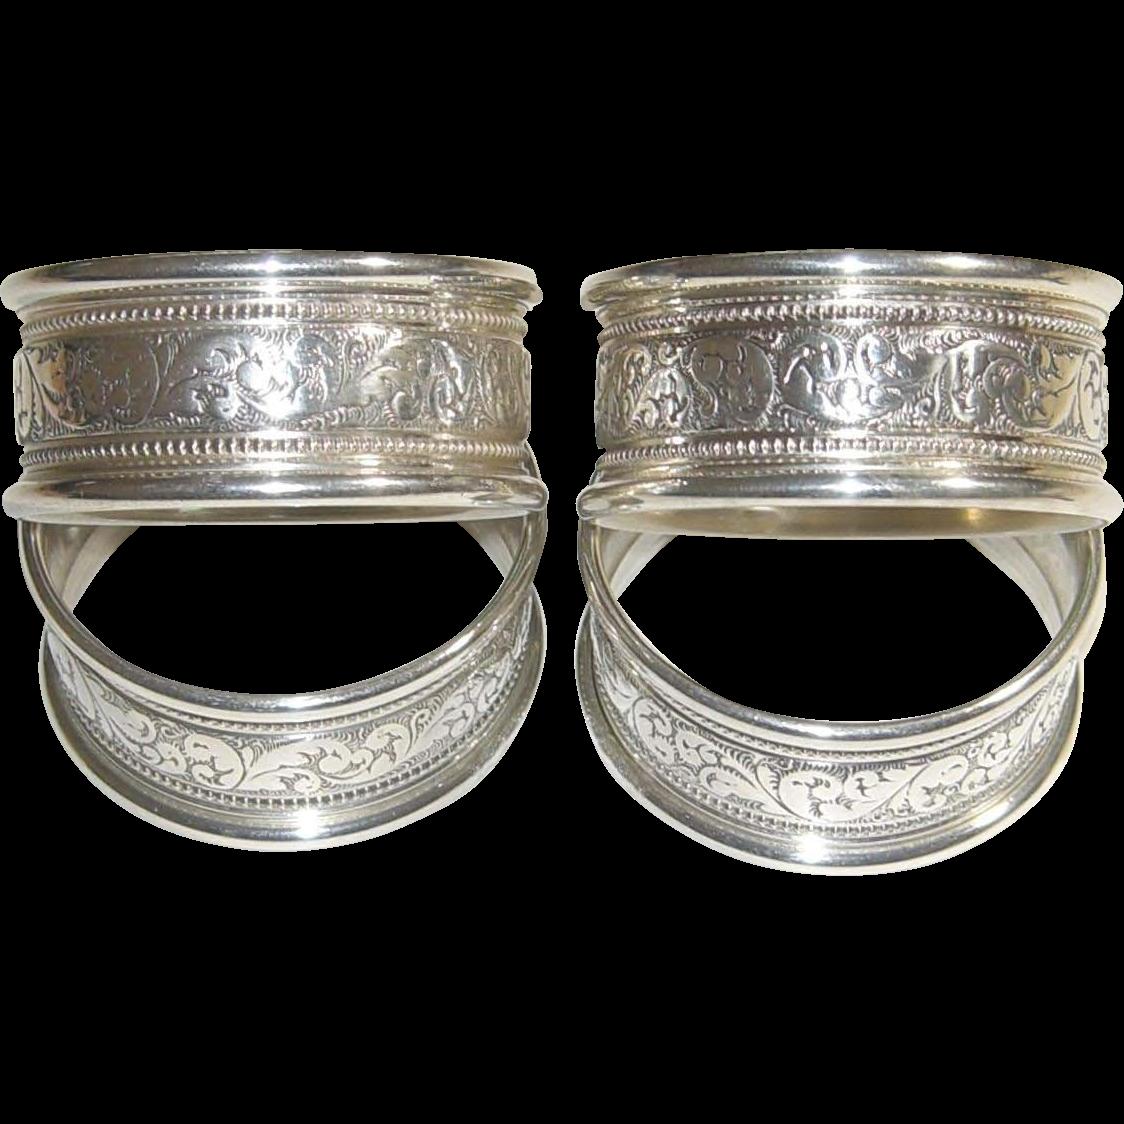 alvin sterling silver napkin rings s17 1 set of 4